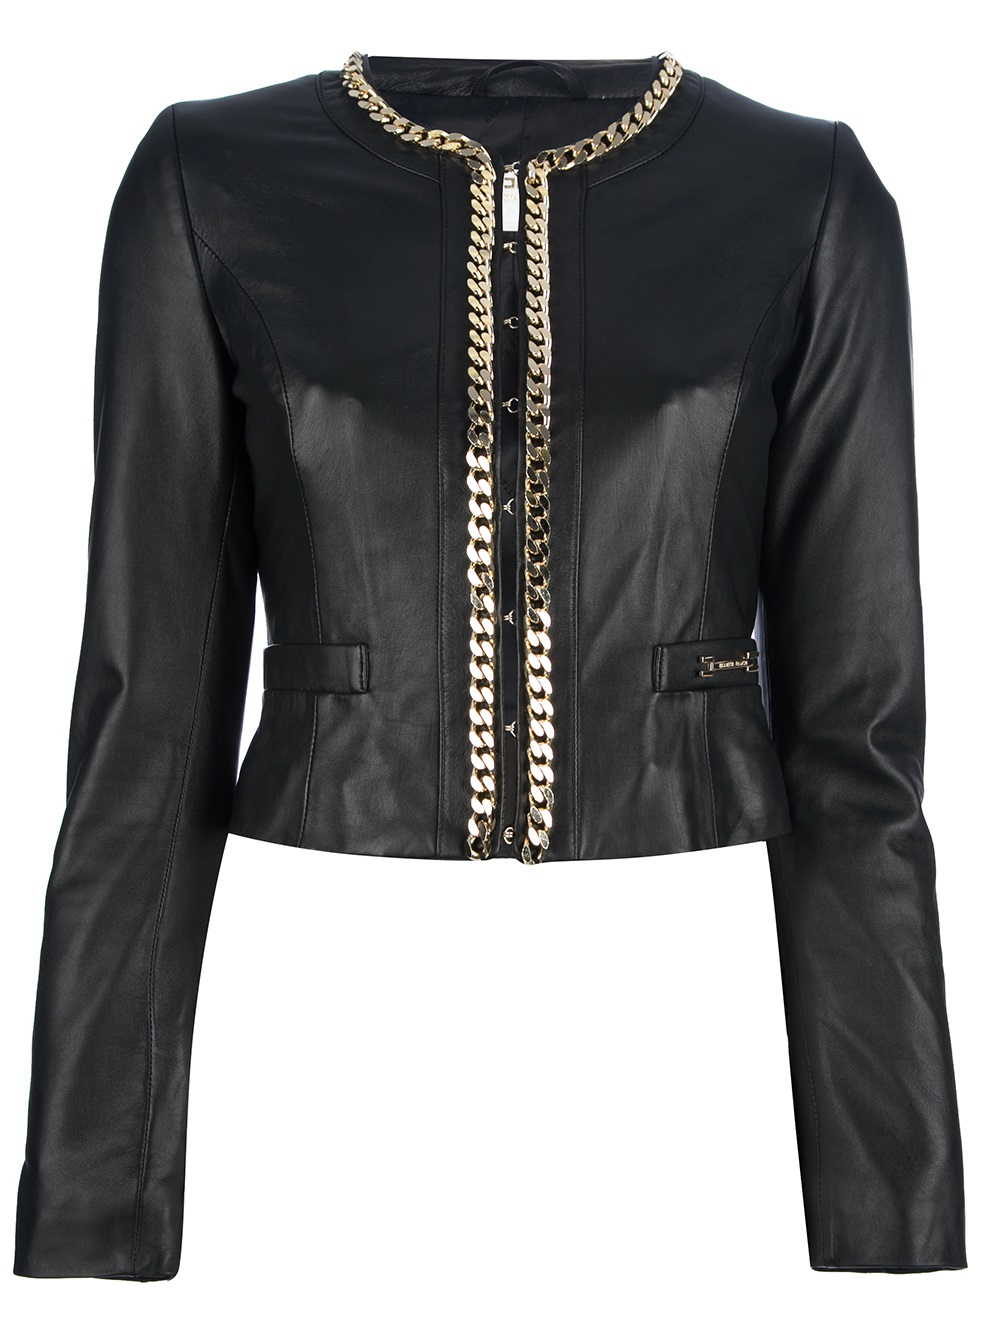 Elisabetta Franchi Chain Trim Leather Jacket In Black Lyst